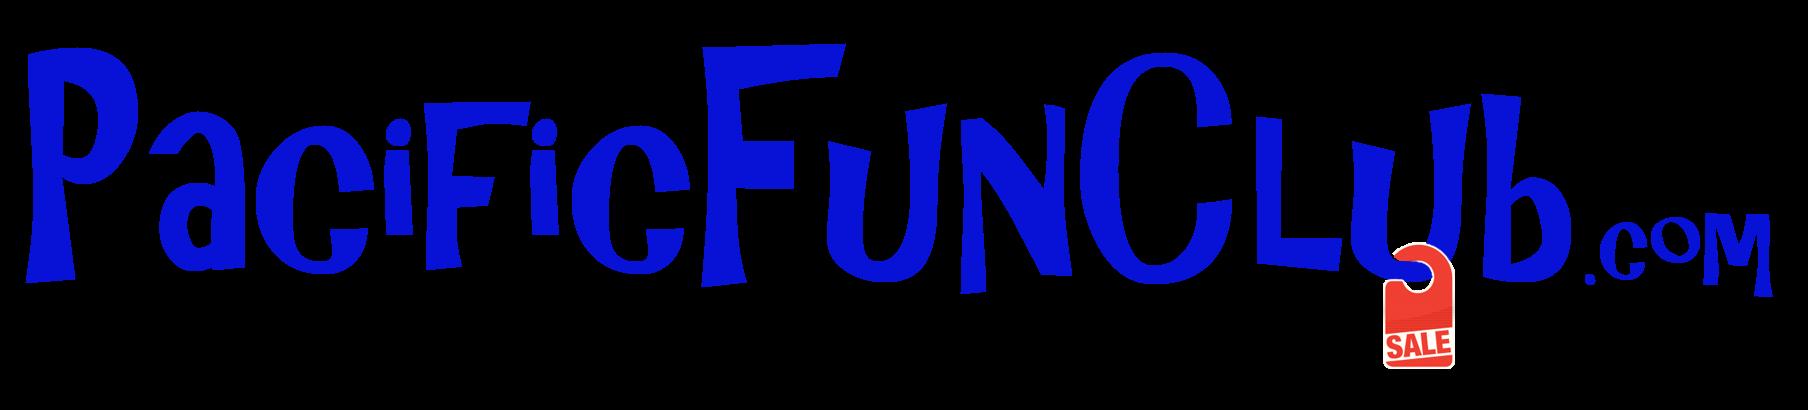 Pacific Fun Club - Big Discounts and Savings!